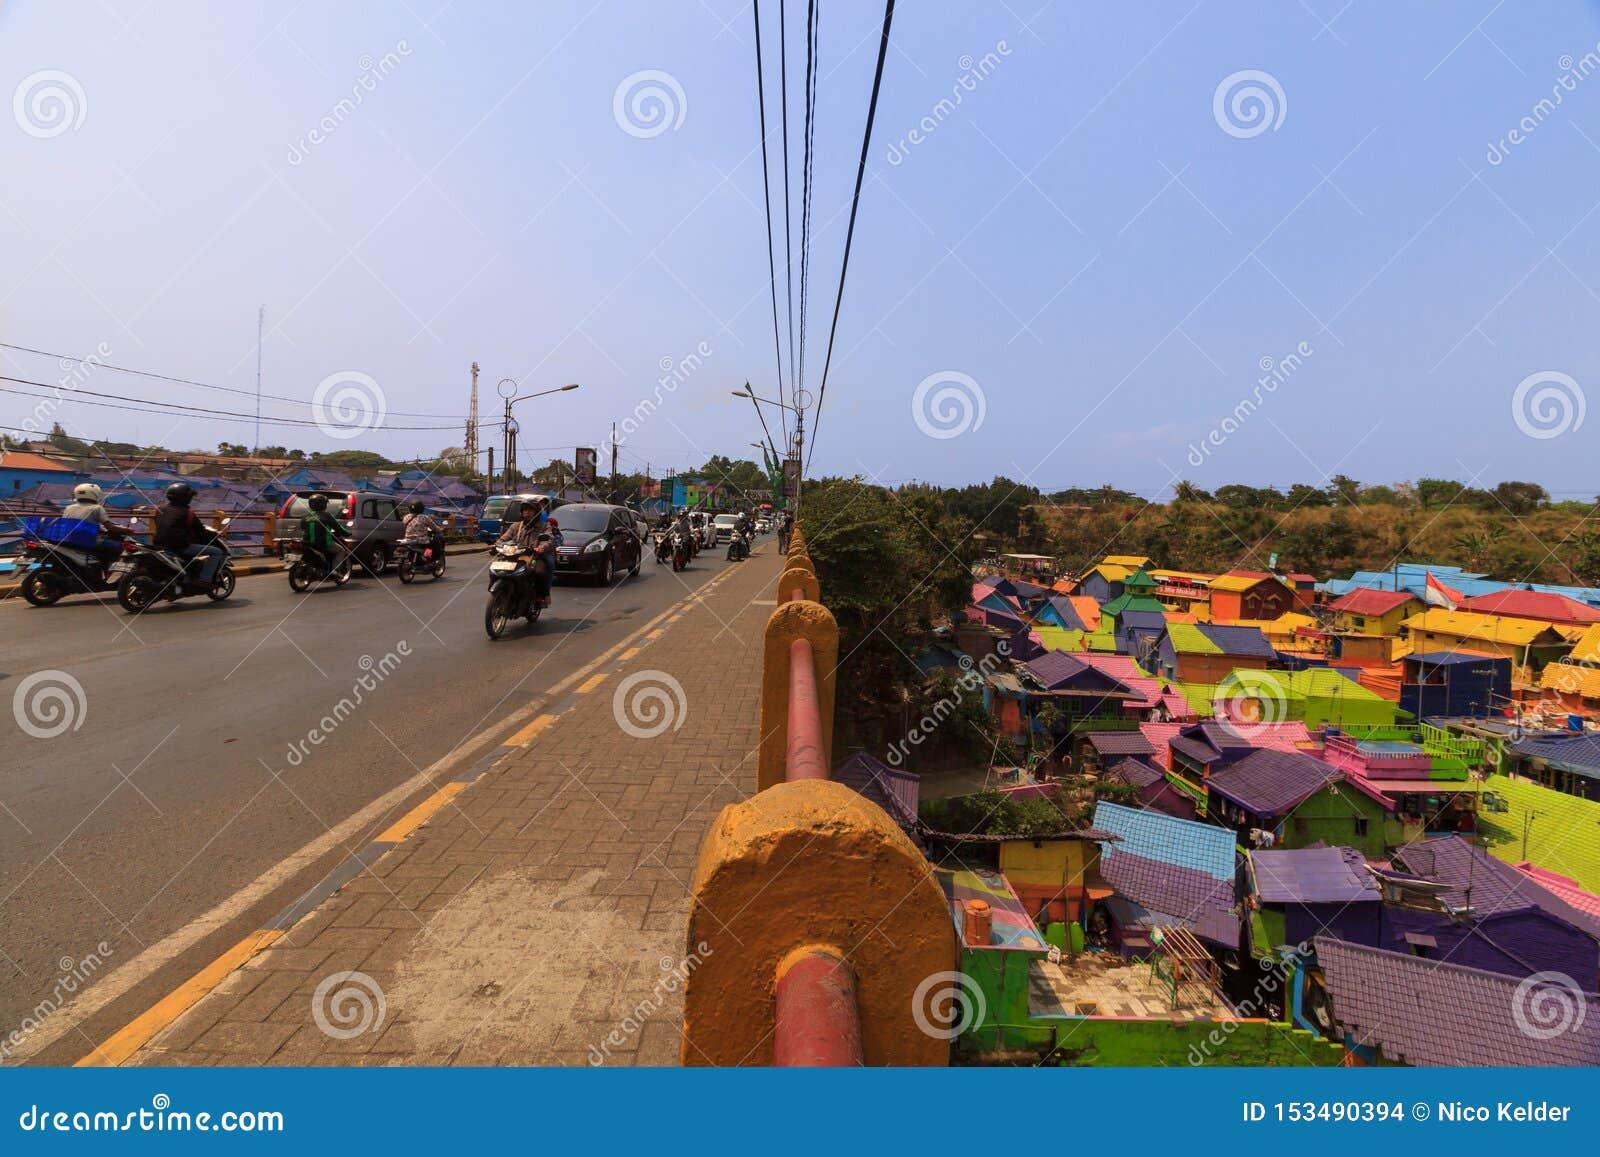 Pueblo colorido Malang de Kampung Warna Warni Jodipan